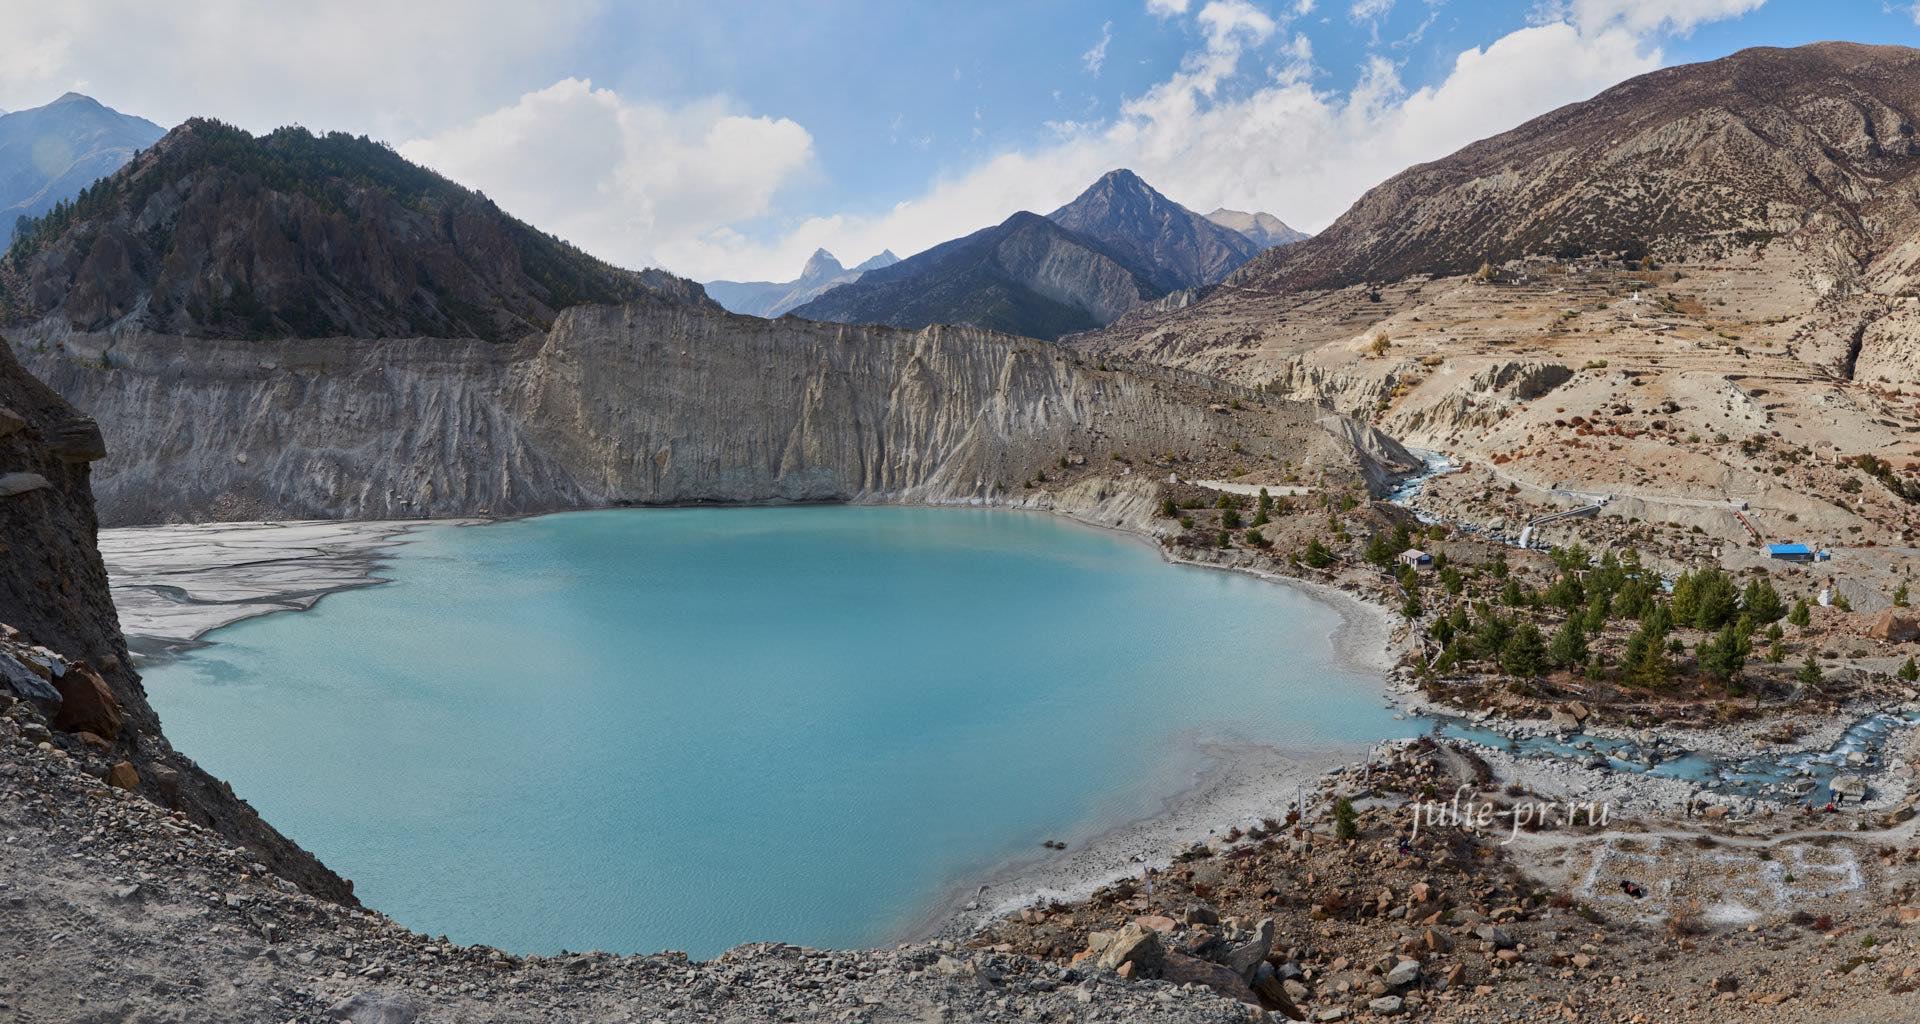 Непал, Трек вокруг Аннапурны, Мананг, озеро